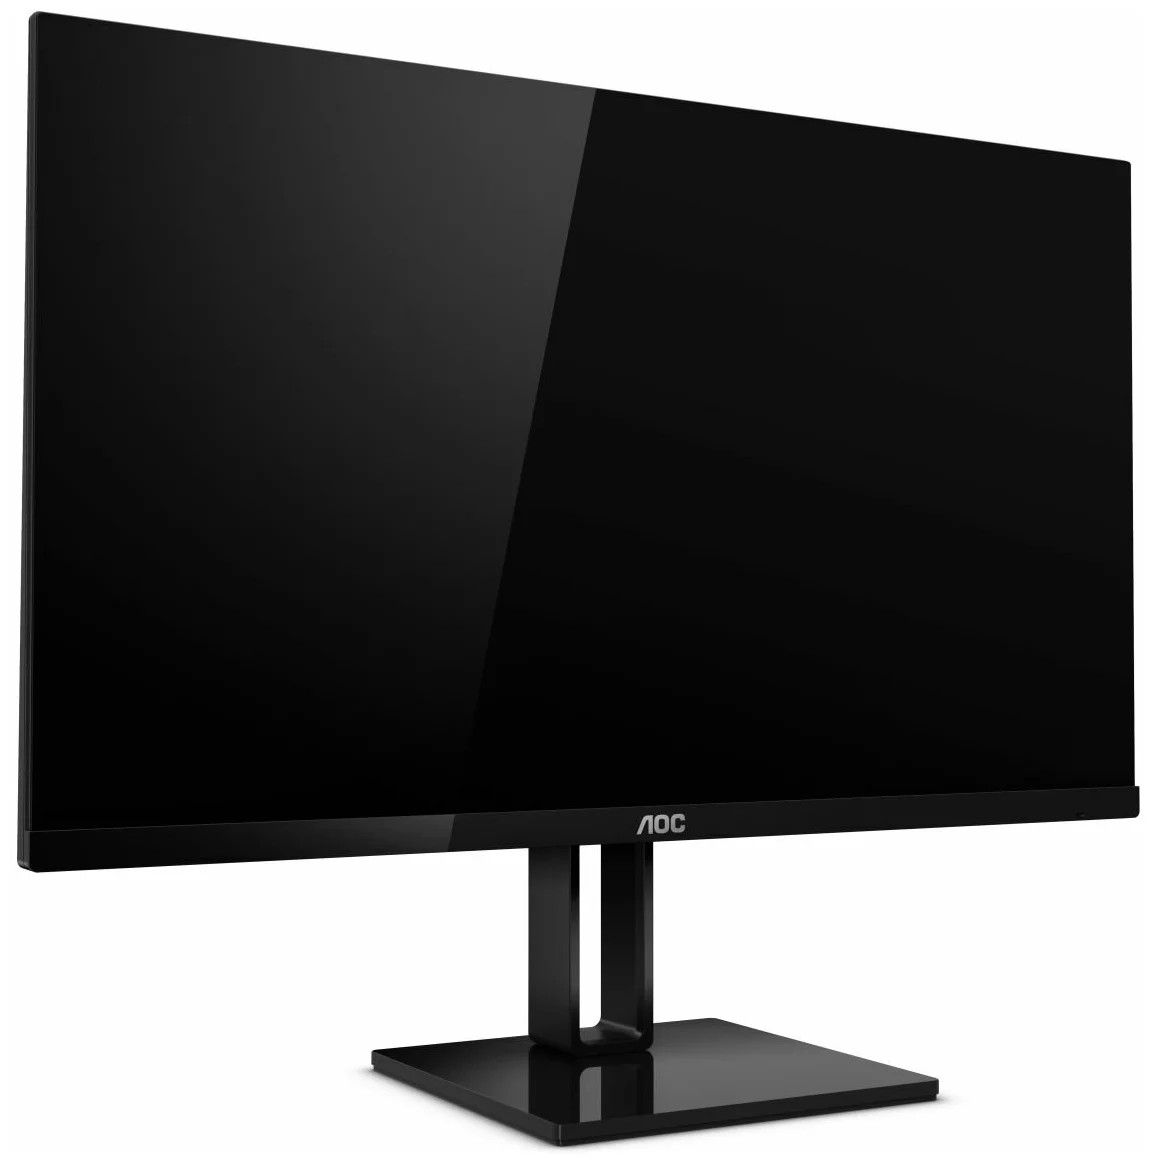 "LCD AOC 27"" 27V2Q (00/<wbr>01) черный IPS 1920x1080 5ms 75hz178/<wbr>178 250cd 1000:1 HDMI (1.4) DisplayPort (1.2) AMDFreeSync AudioOut"